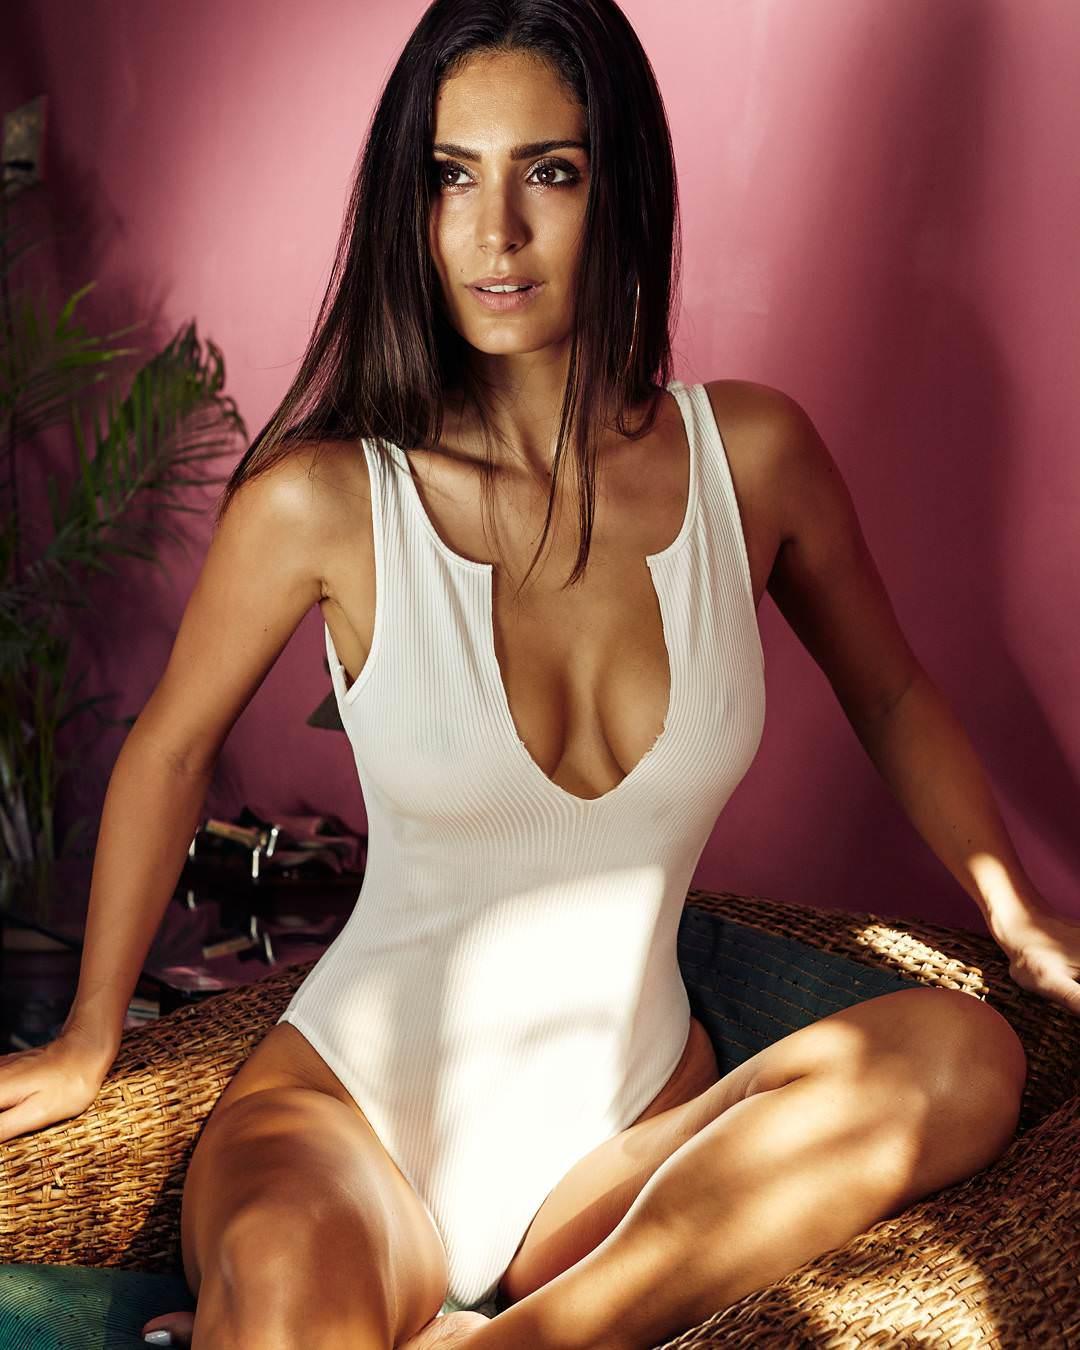 bruna abdullah nude